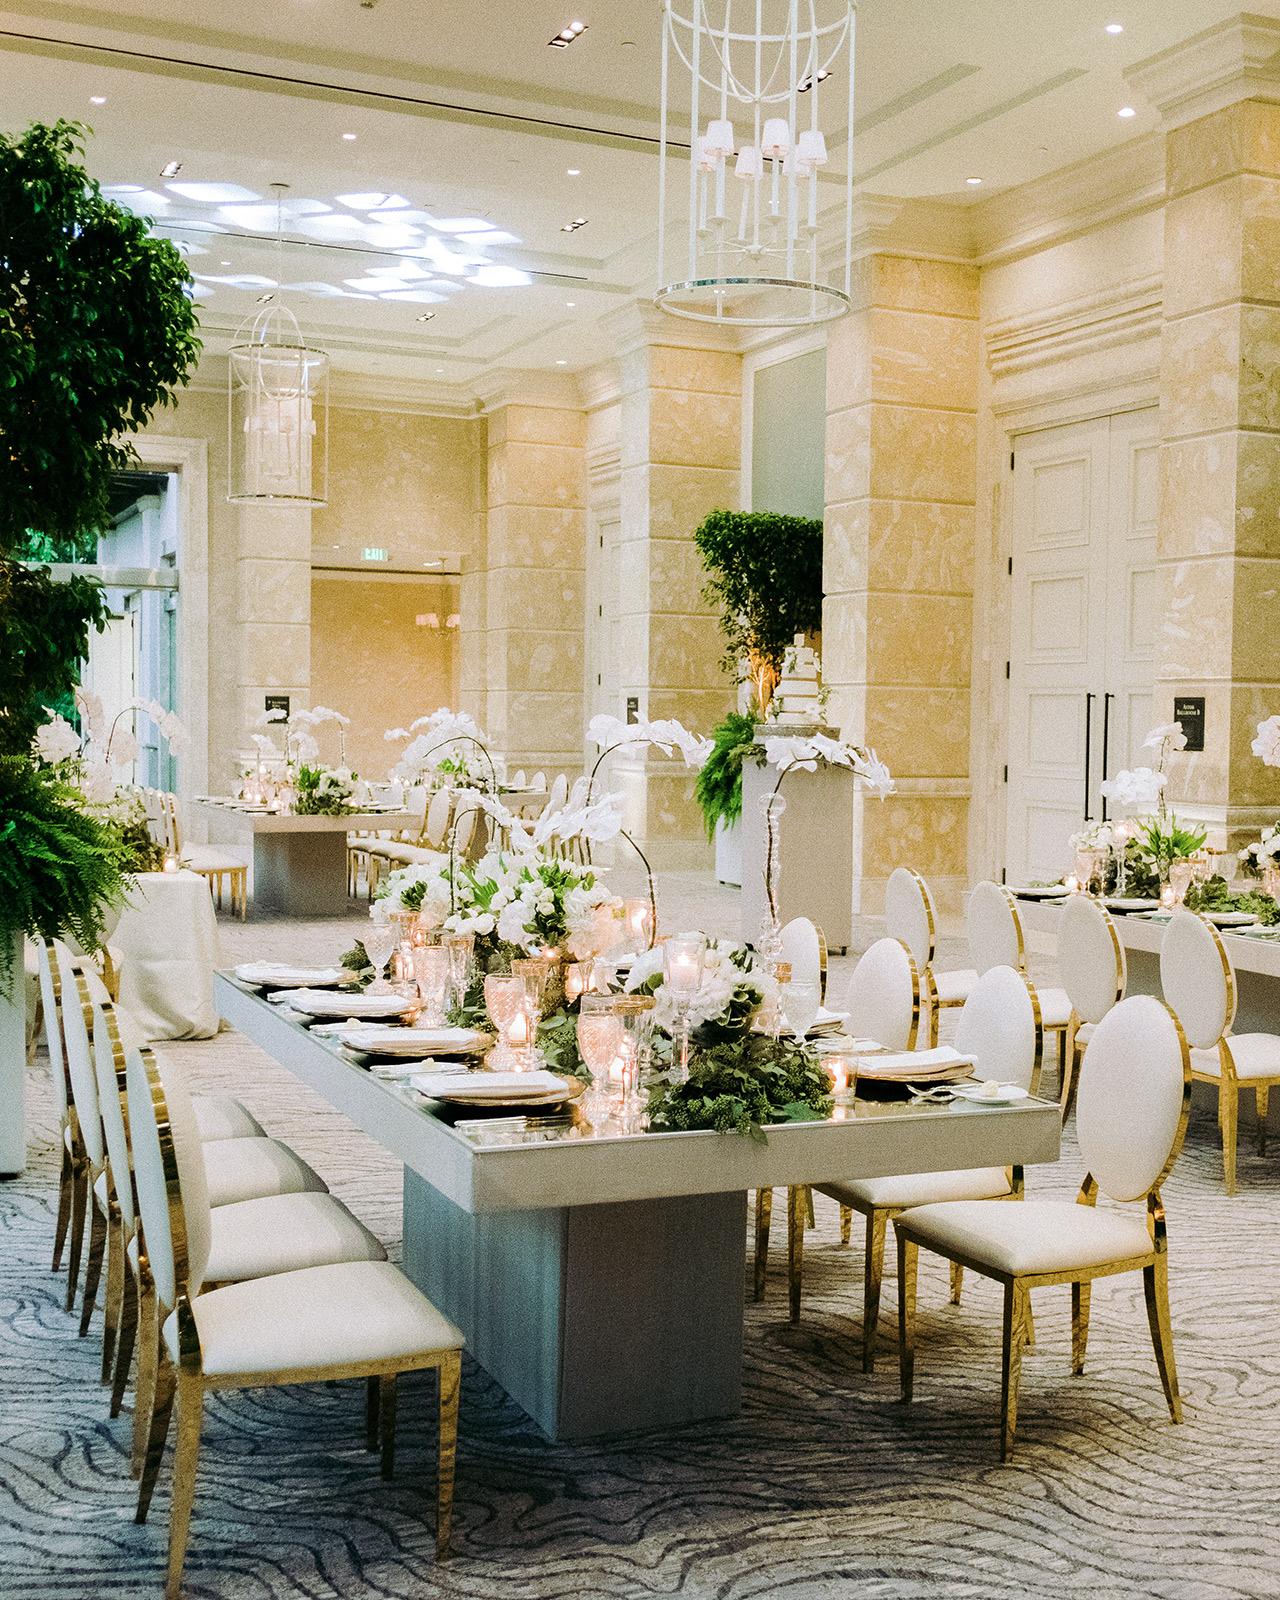 wedding reception ballroom rectangular tables gold chairs